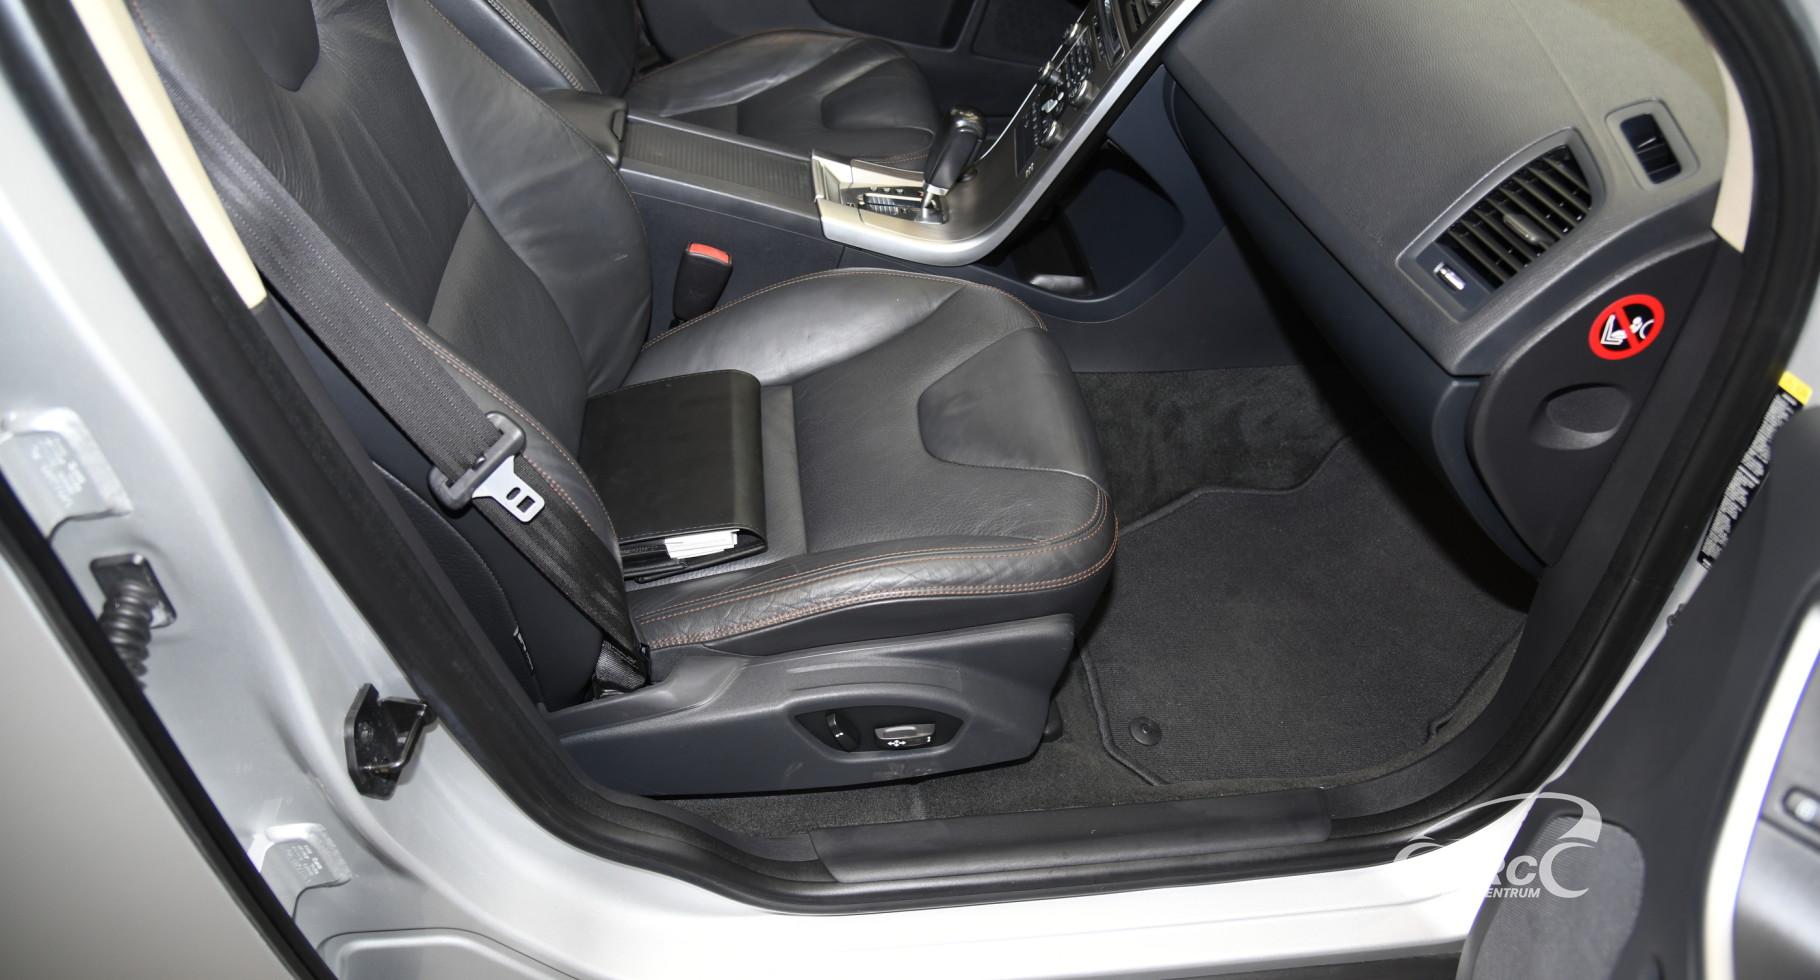 Volvo XC 60 3.0 T6 AWD Automatas